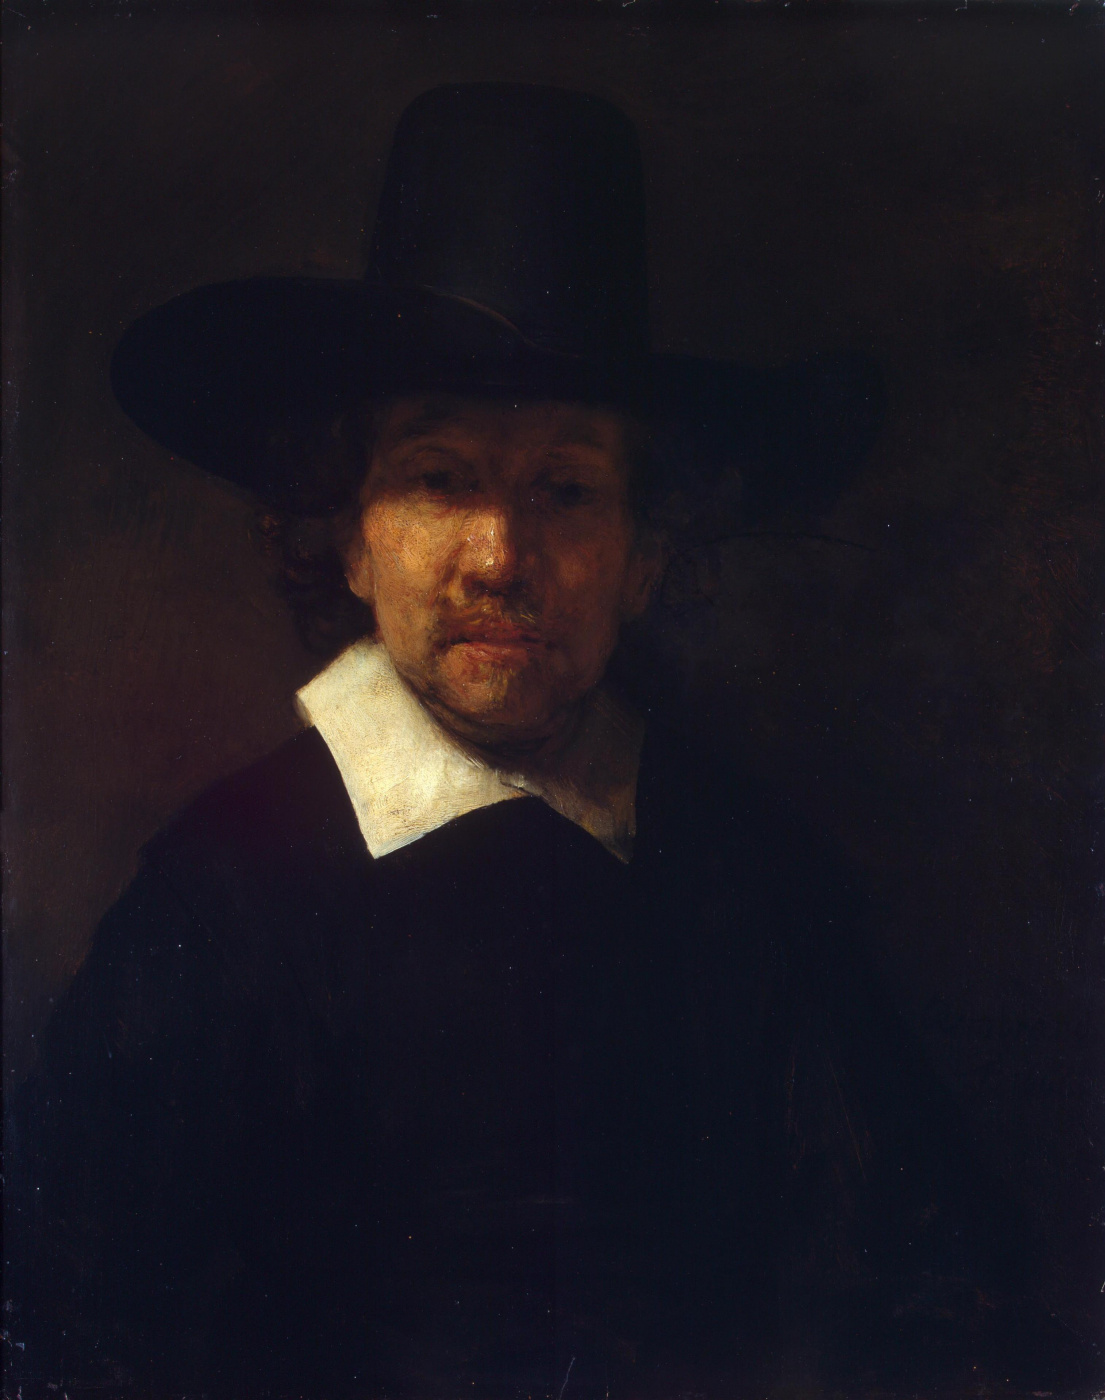 Rembrandt Harmenszoon van Rijn. Portrait of the poet Jeremias de Decker